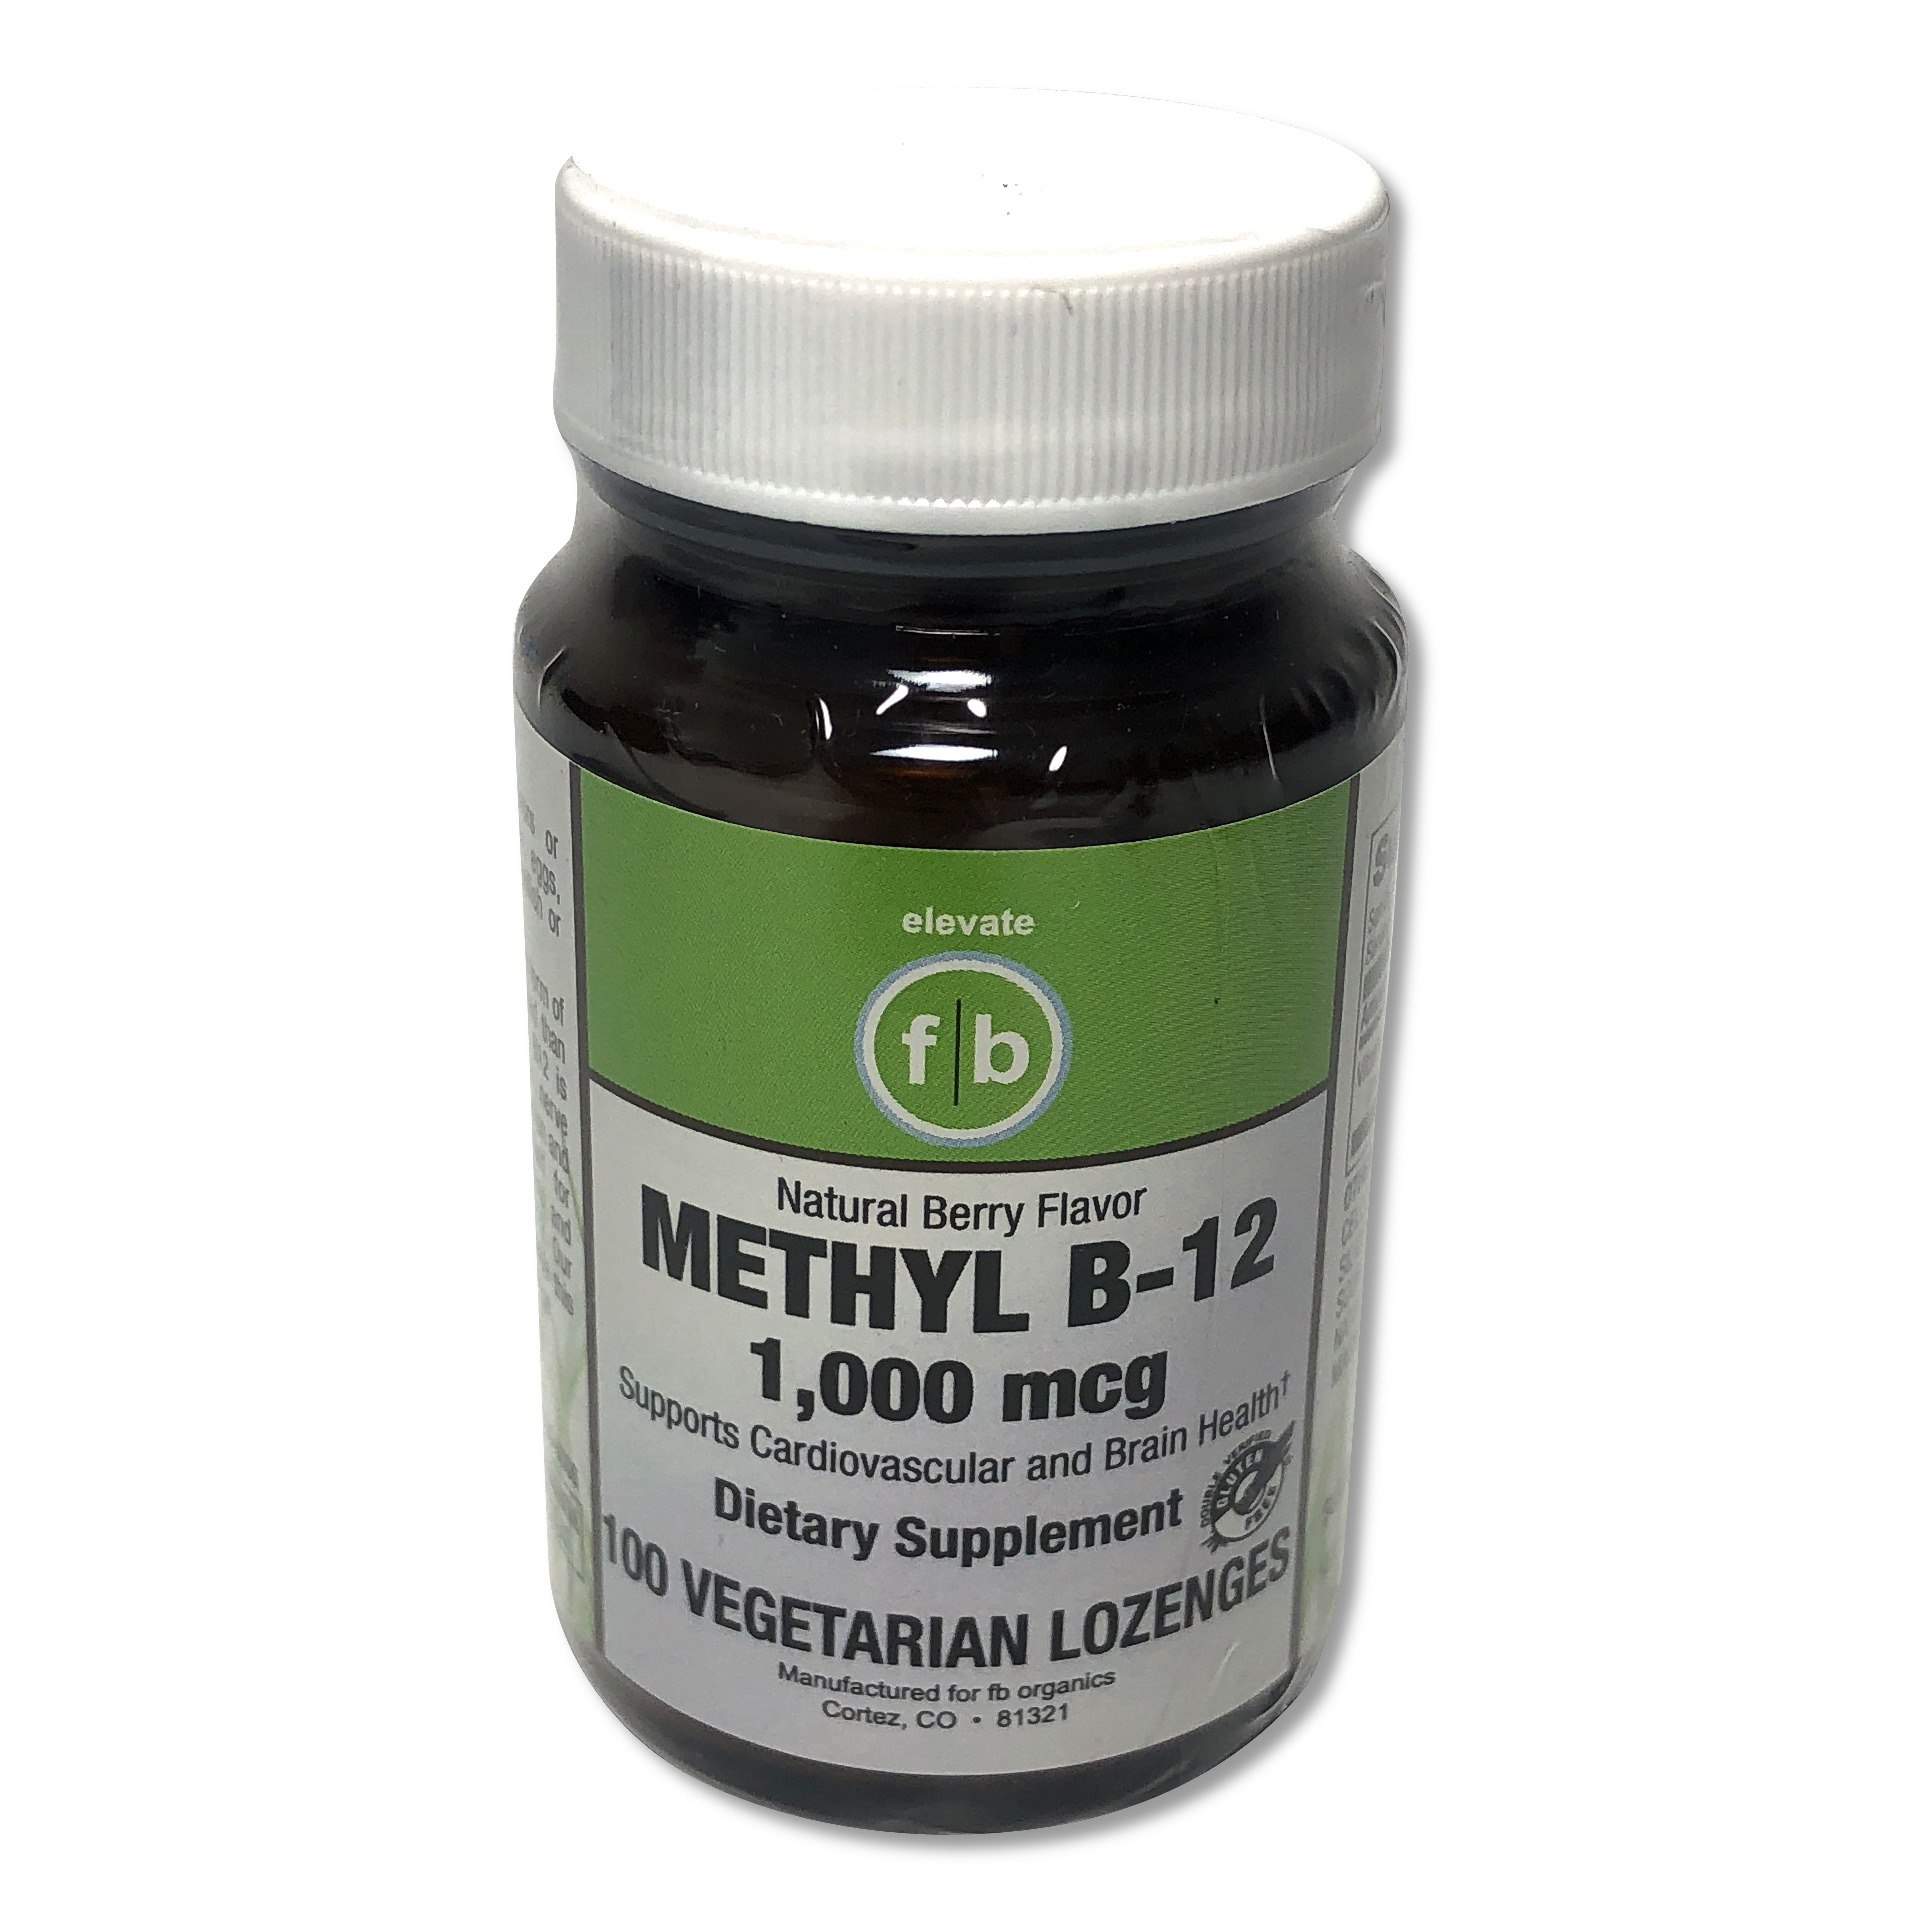 Methyl B-12 1,000 mcg-1